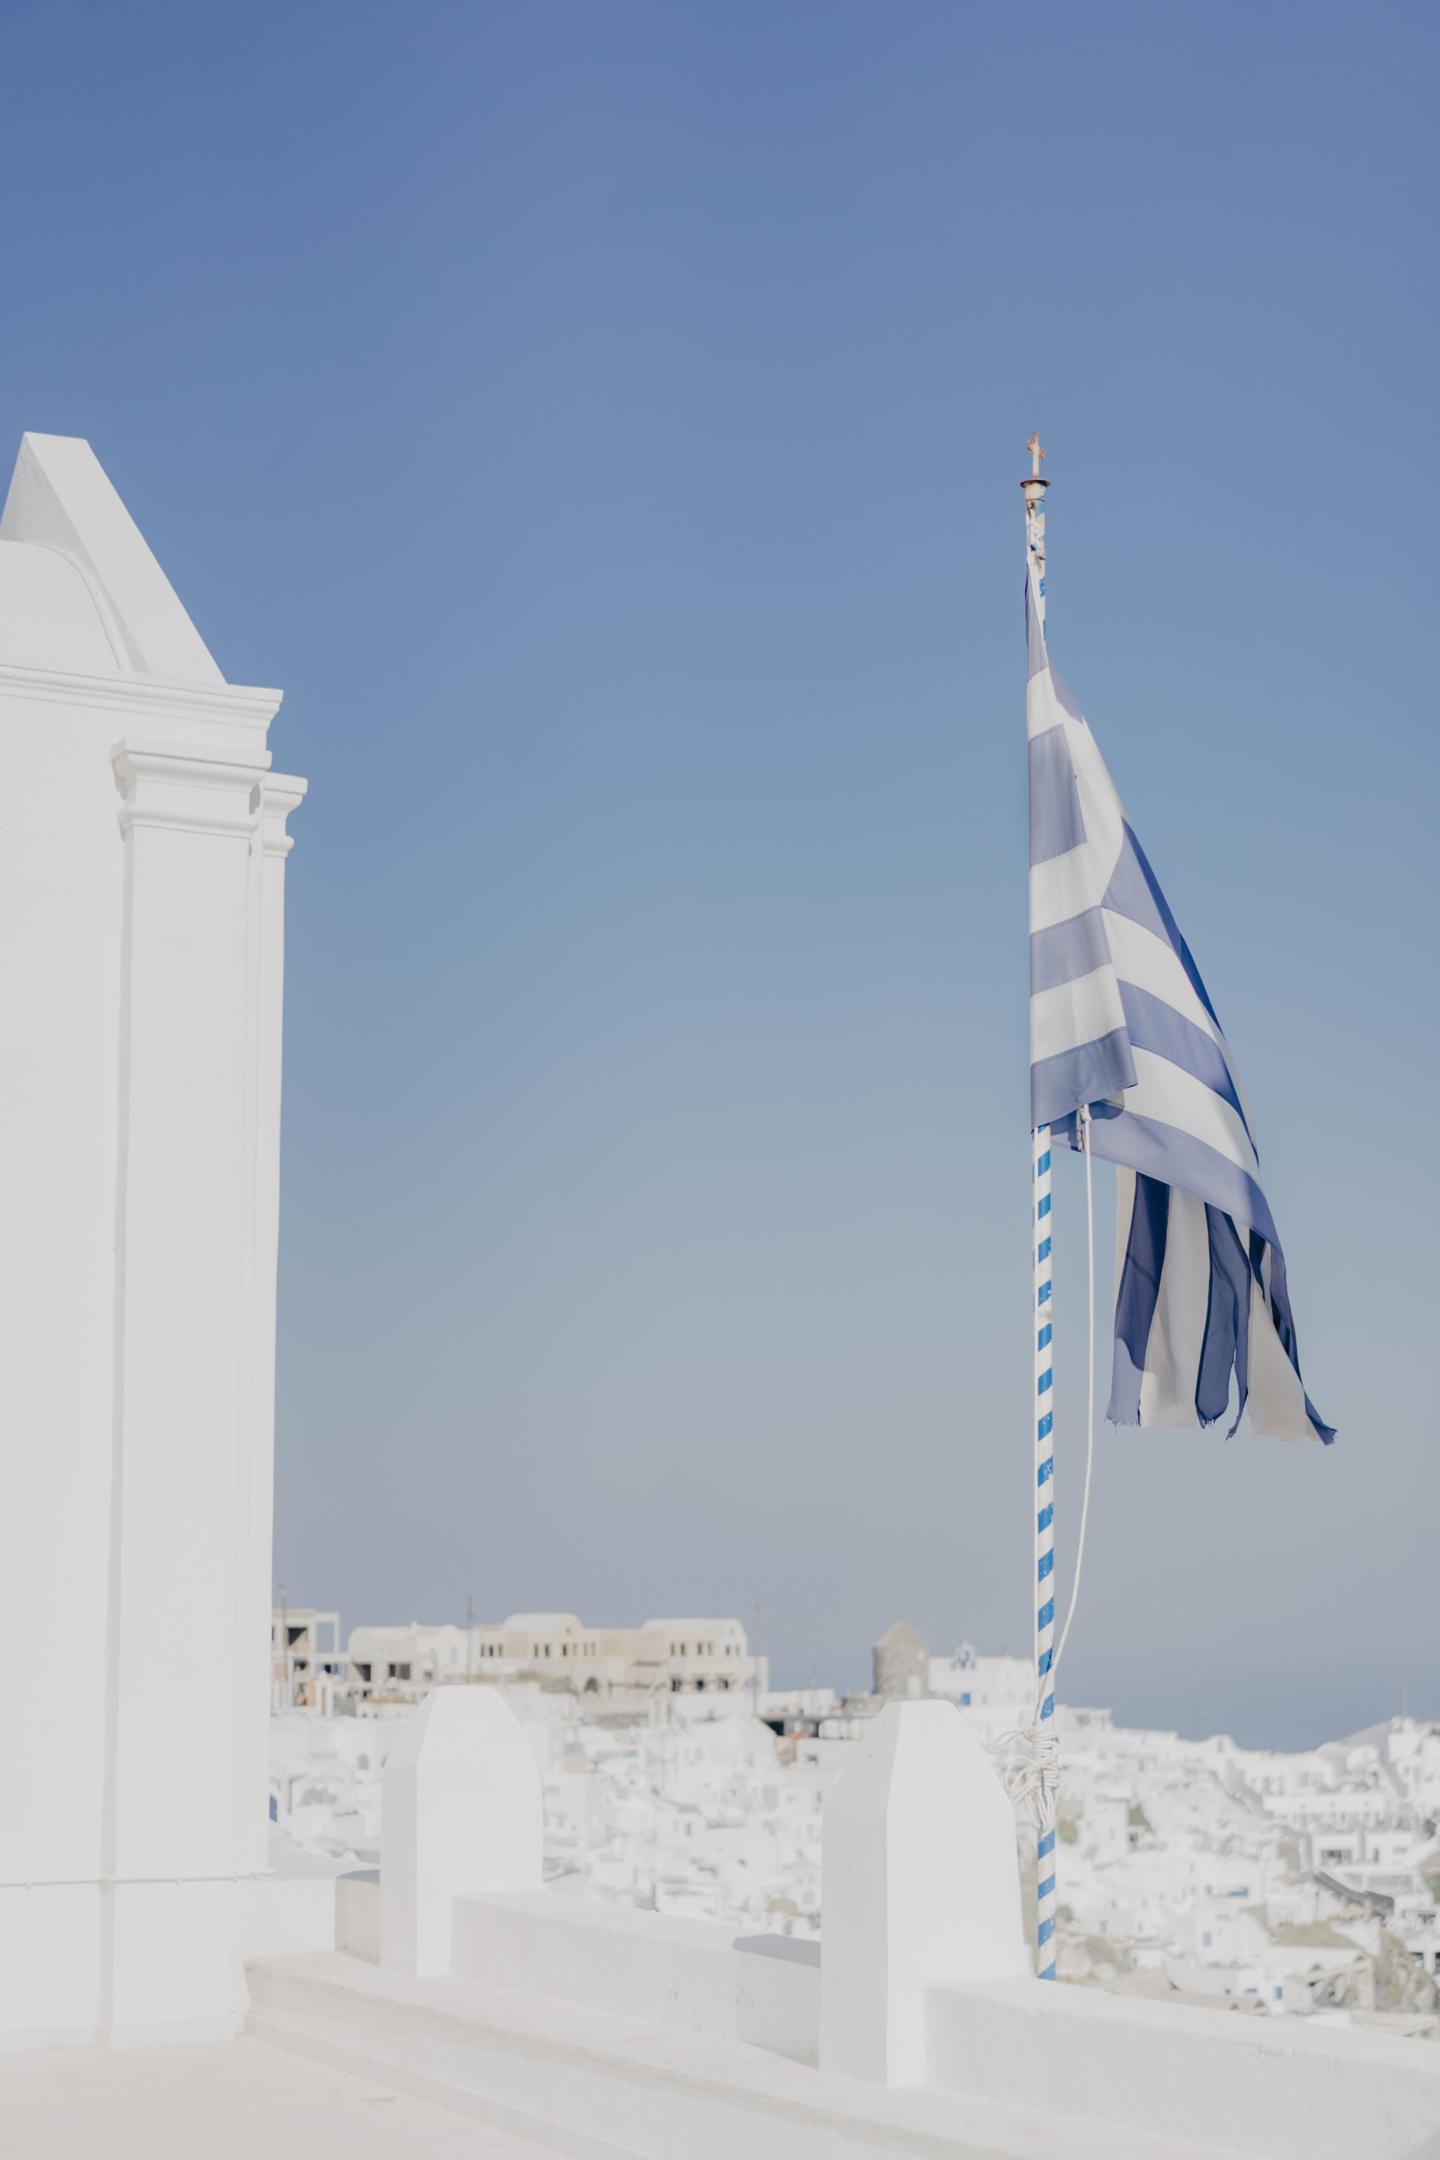 - 21 :: Santorini, a white wedding in a white island :: Luxury wedding photography - 20 ::  - 21